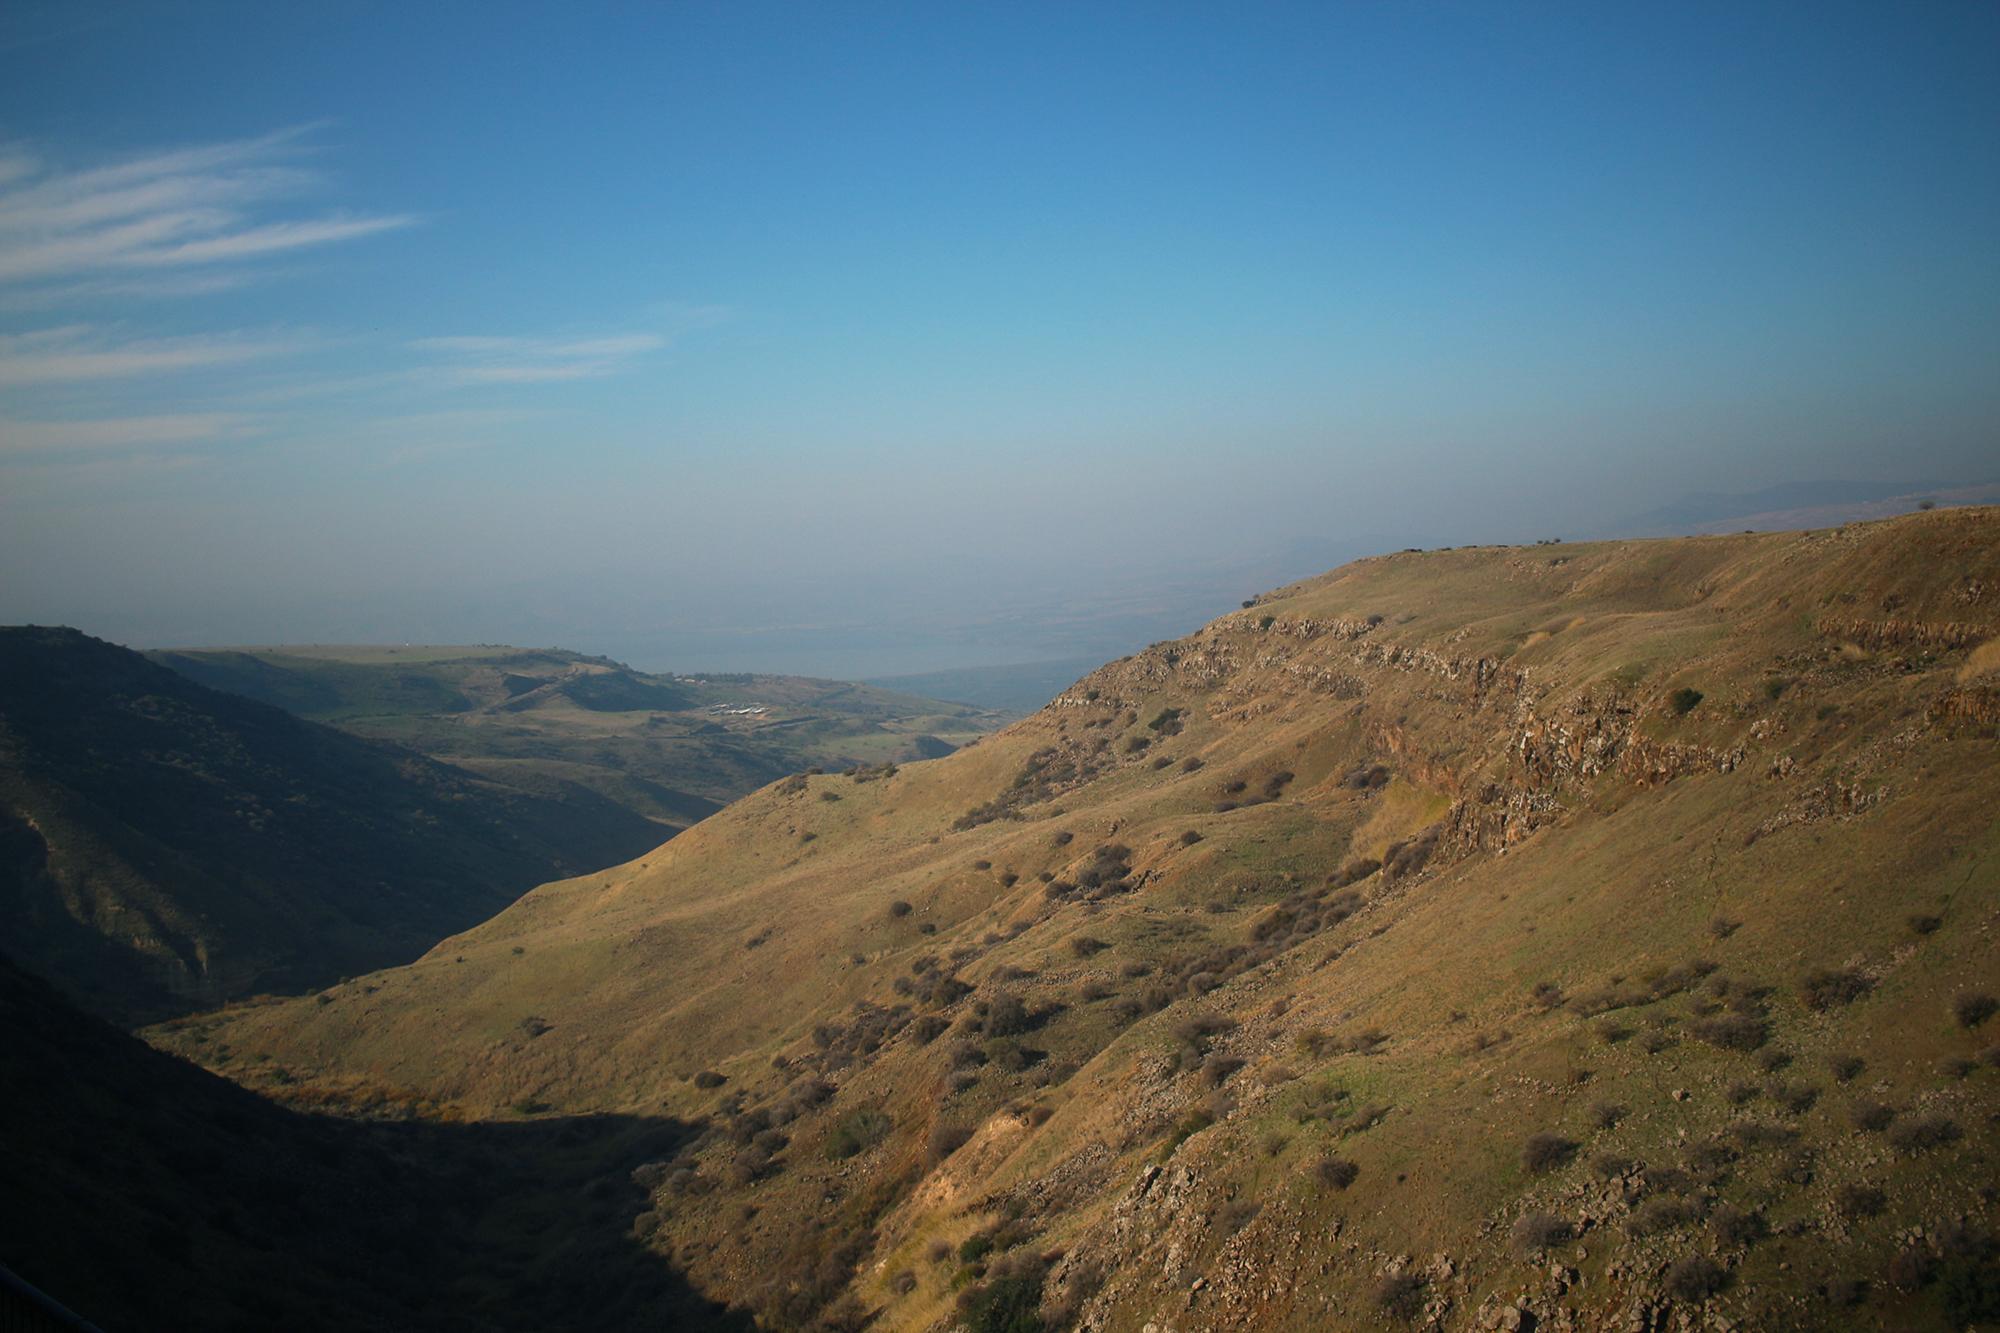 View across Gamla in Golan Heights, Israel. Travel photography by Geena Matuson @geenamatuson #thegirlmirage.